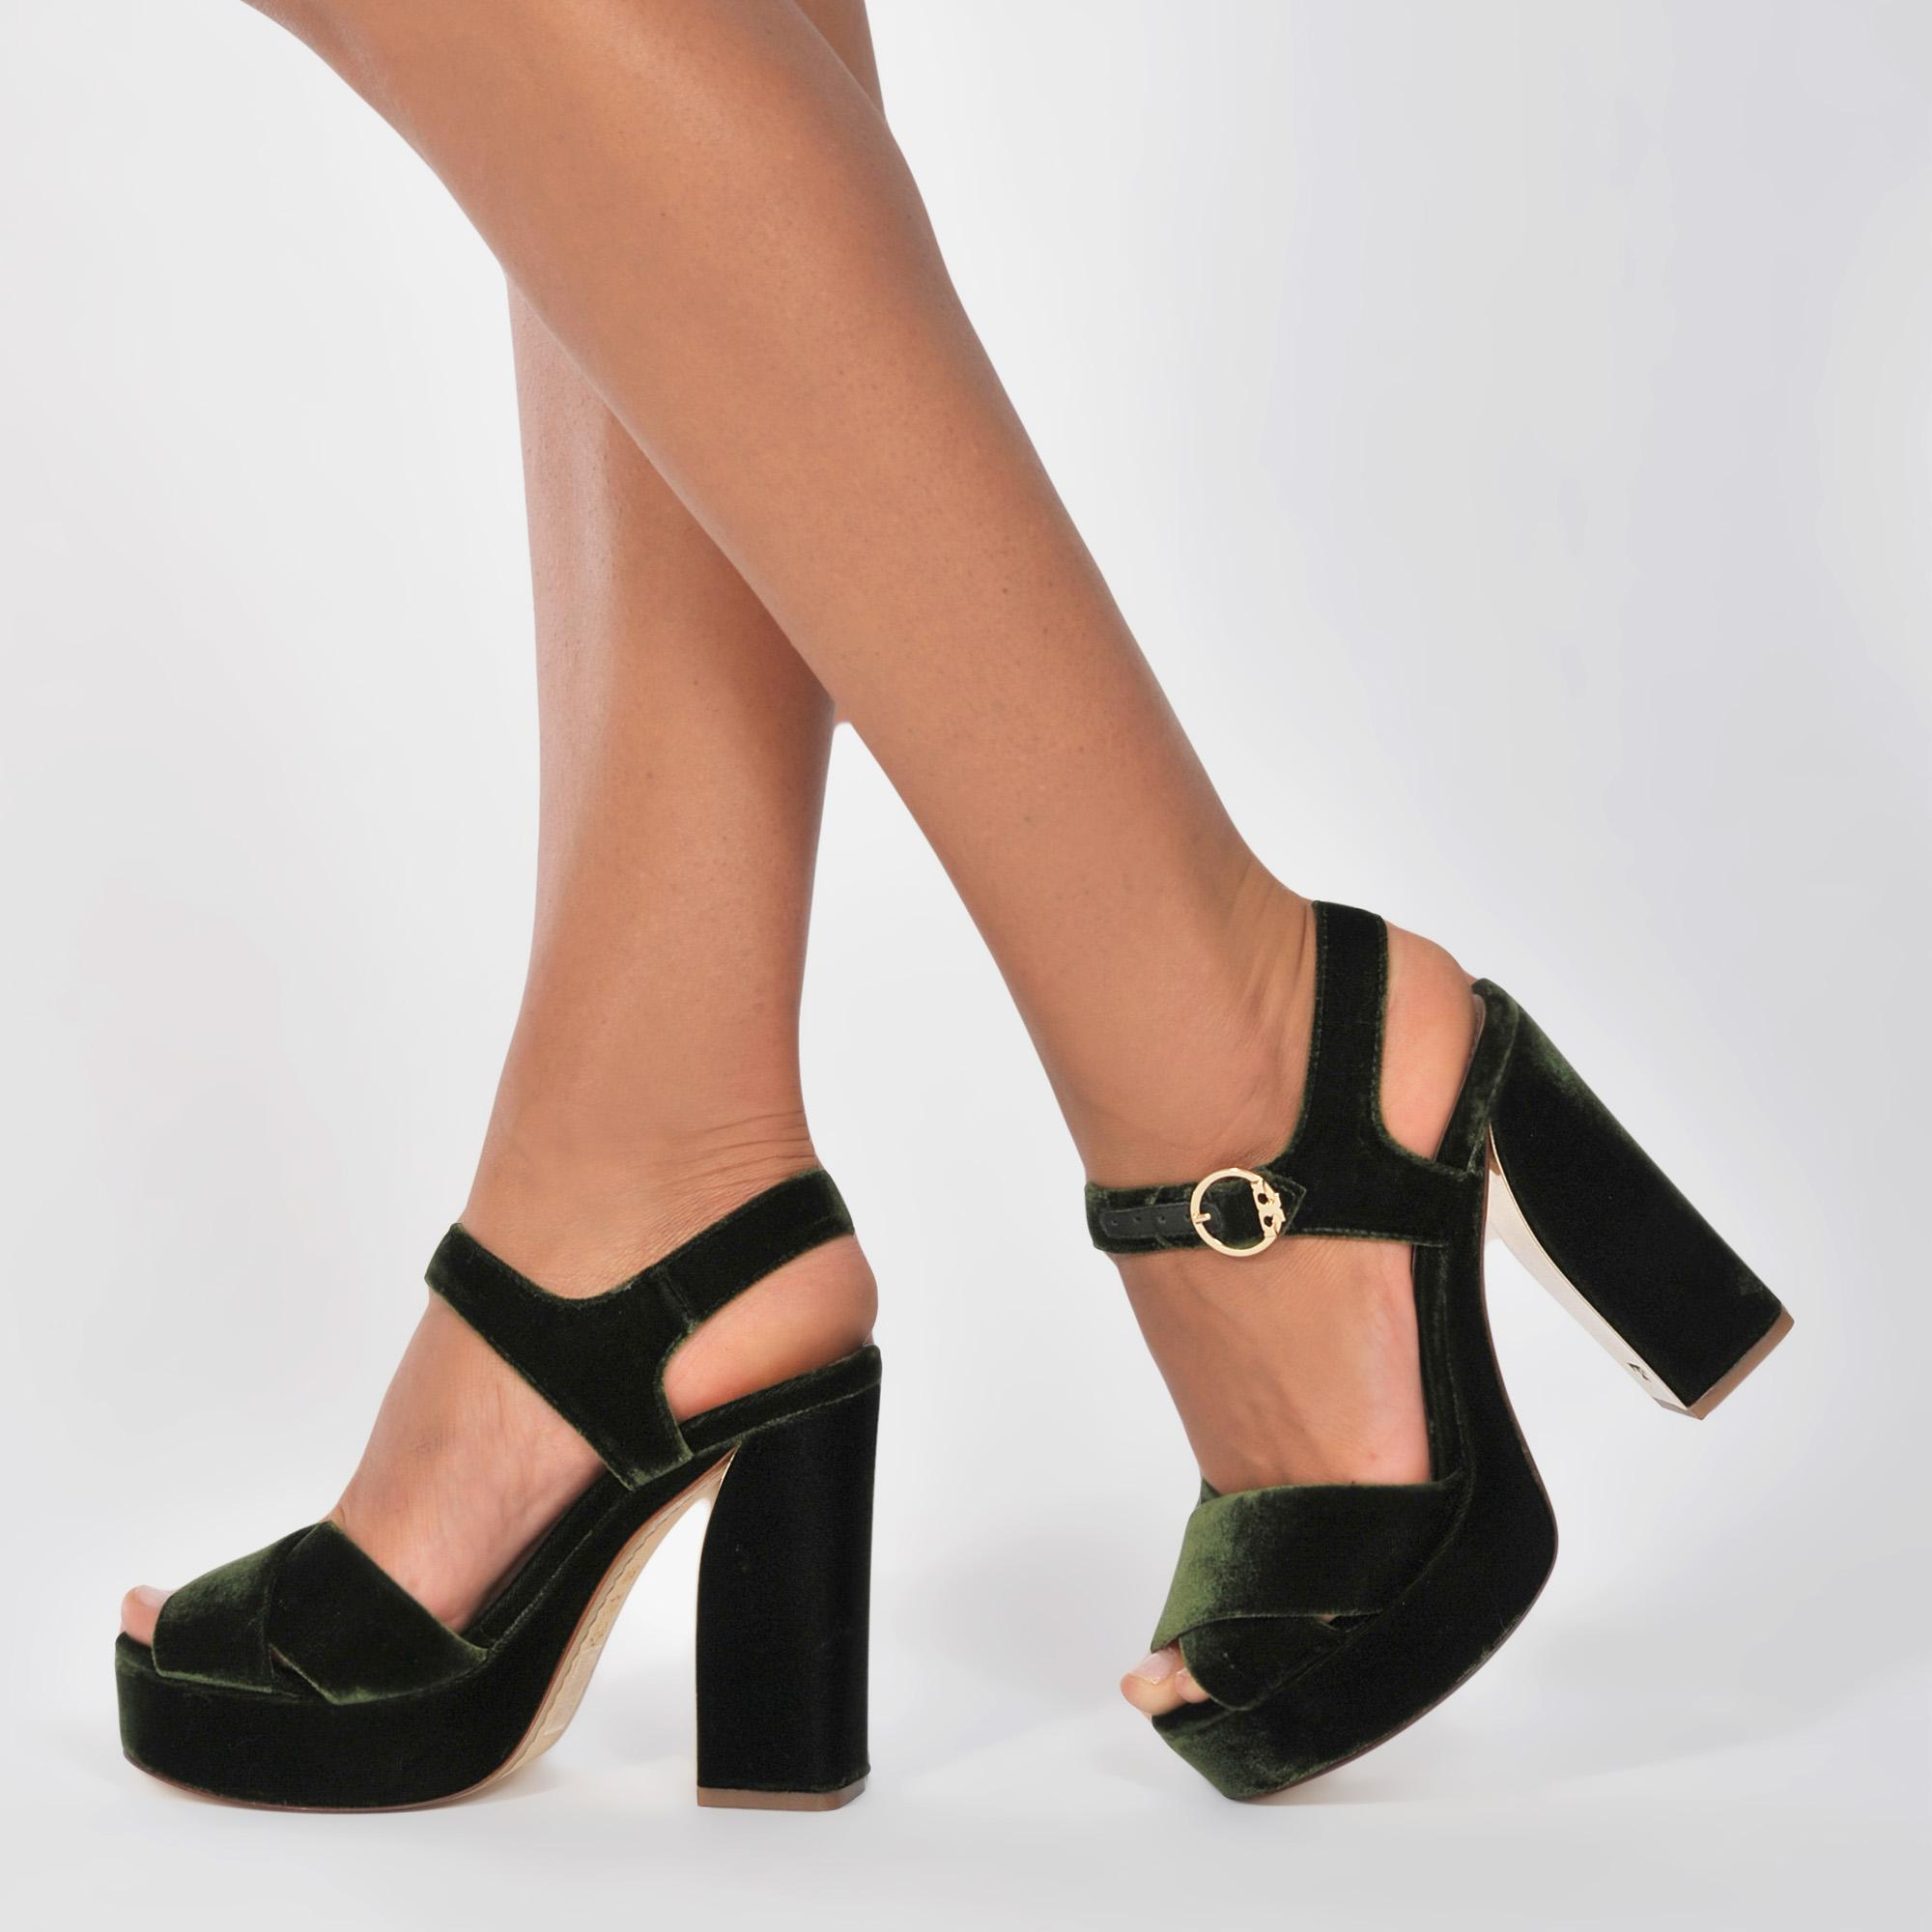 04d1f6f18cd Lyst - Tory Burch Loretta Velvet Platform Sandal in Black